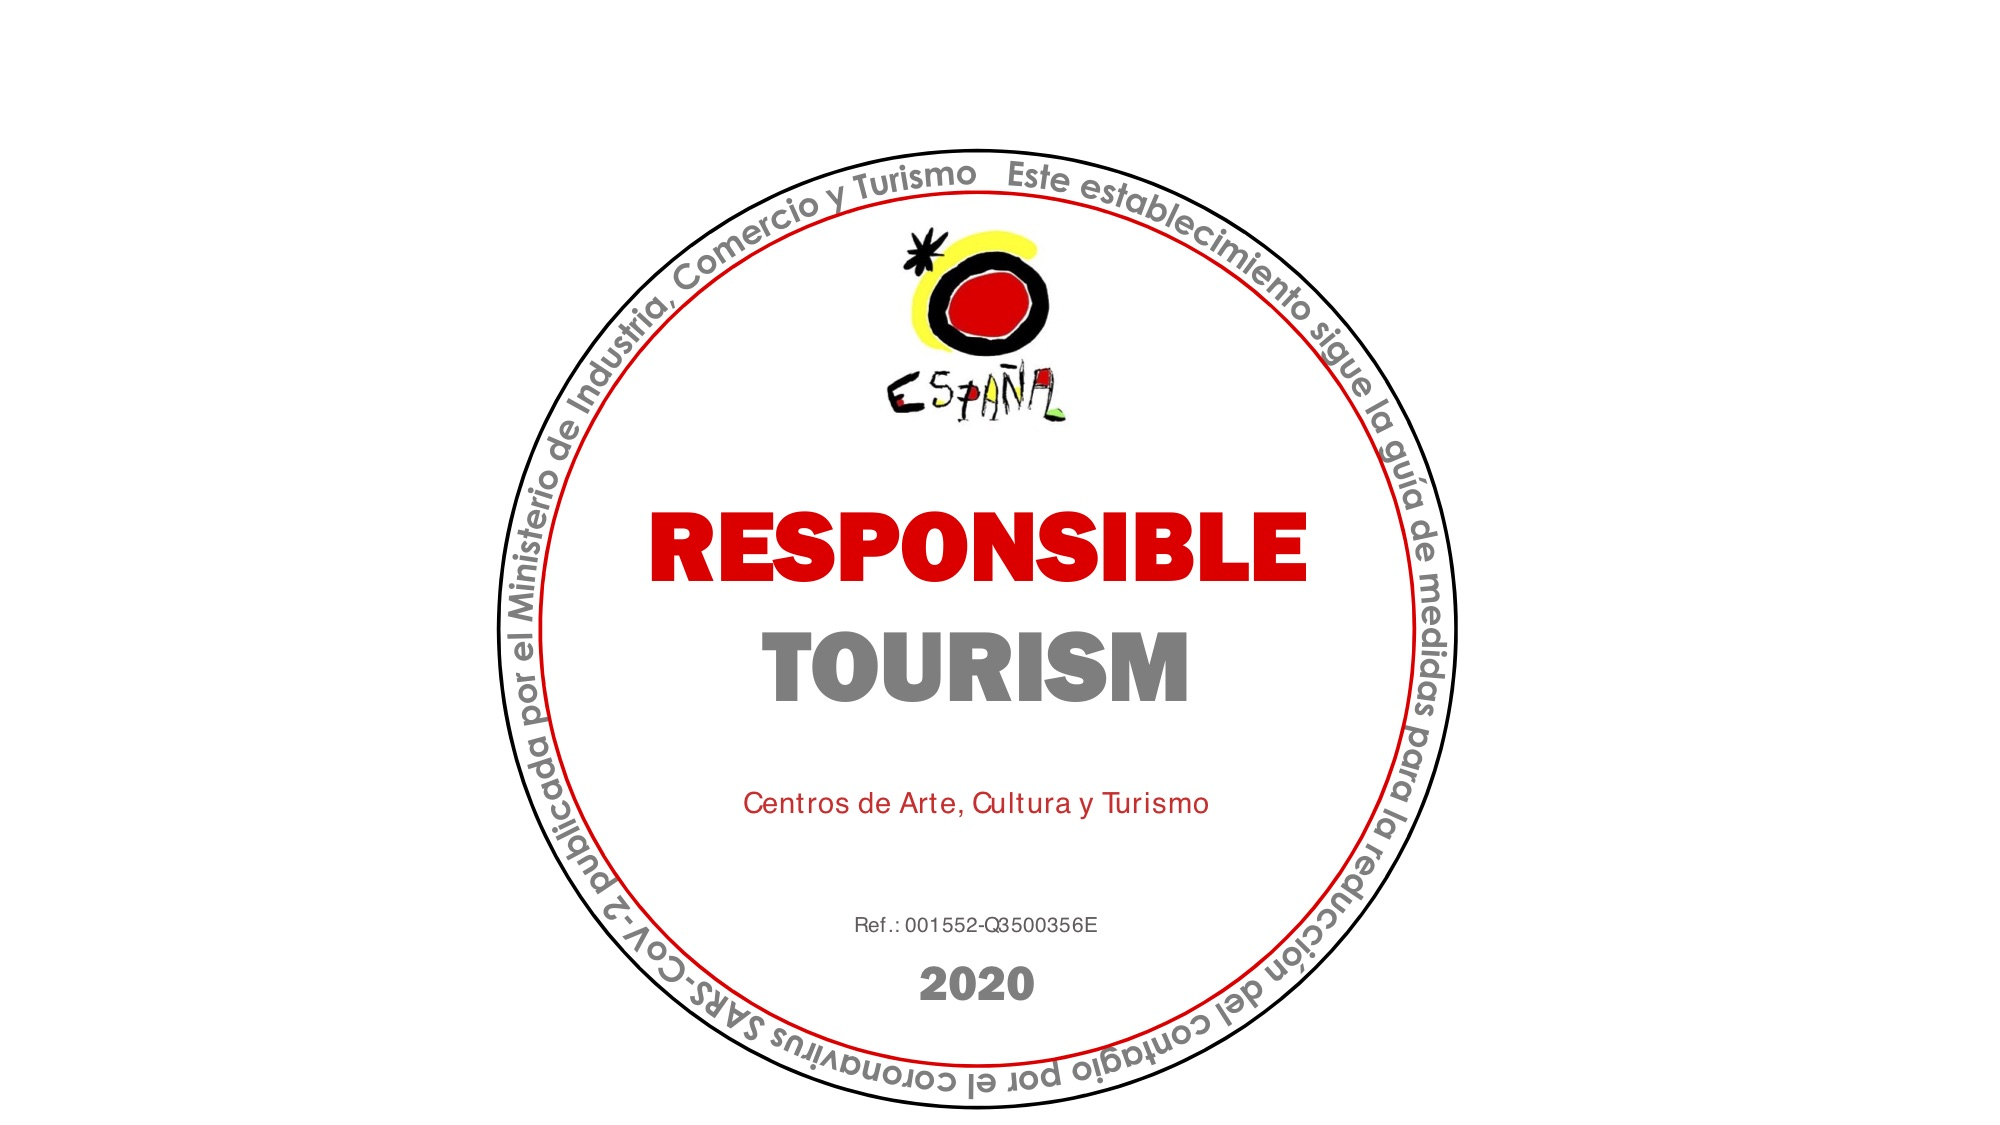 Certificado Turismo Seguro Responsible Tourism